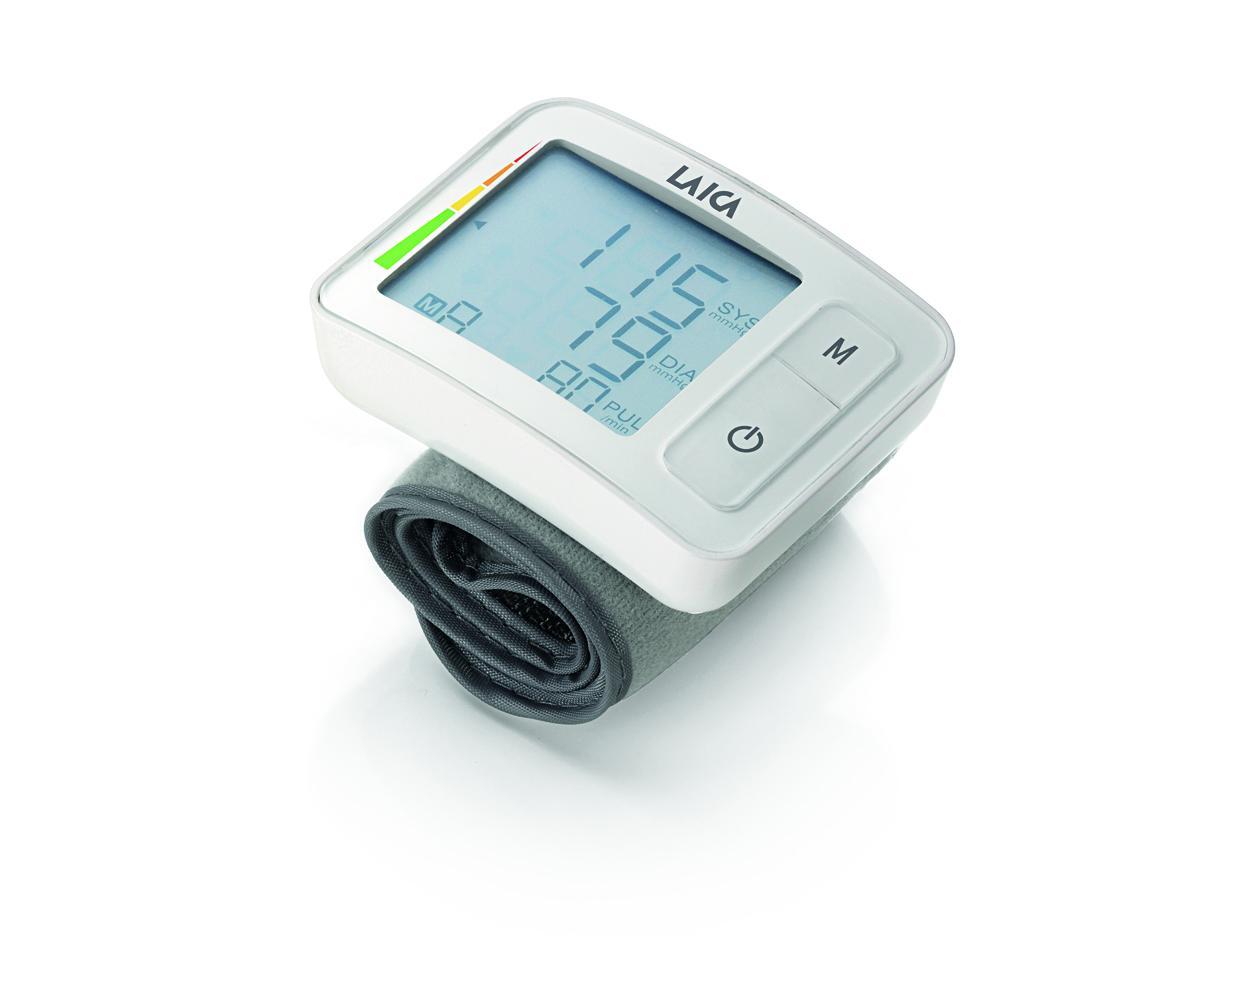 Tensiometru automat de incheietura Laica BM7003 Bluetooth laicashop.ro 2021